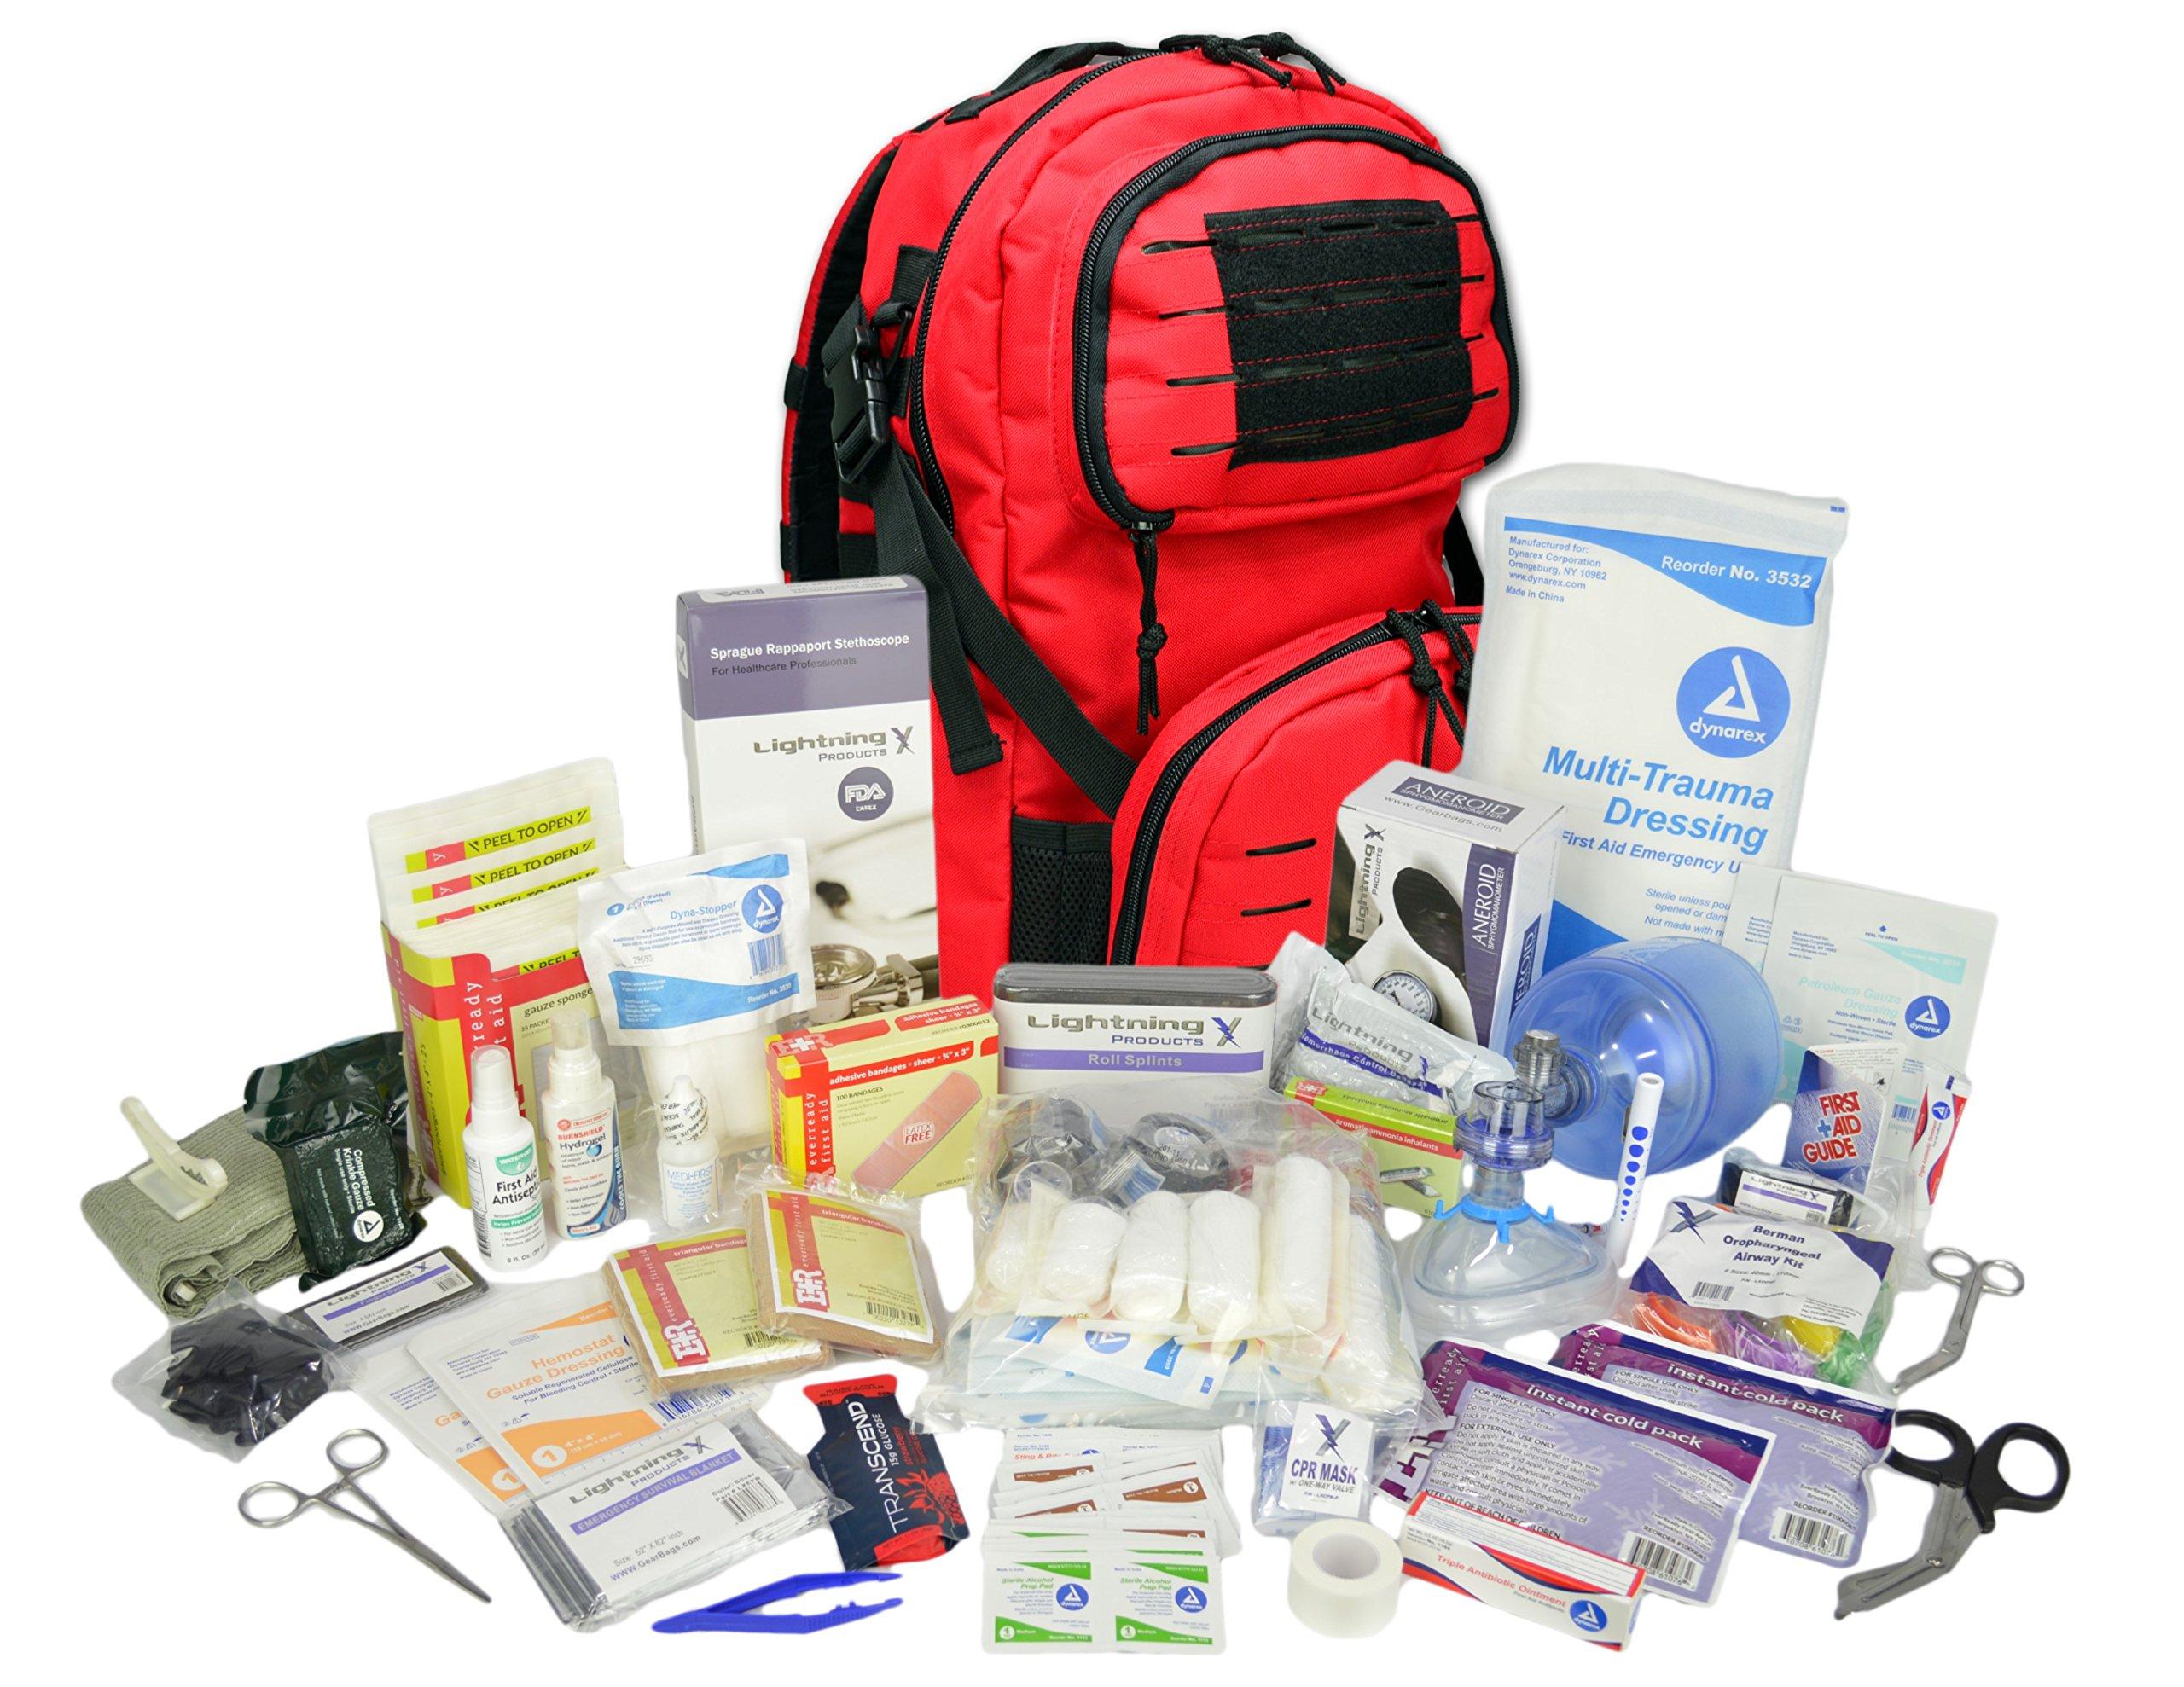 Lightning X Stocked Modular Trauma & Bleeding First Aid Responder Medical Backpack + Kit (Red)